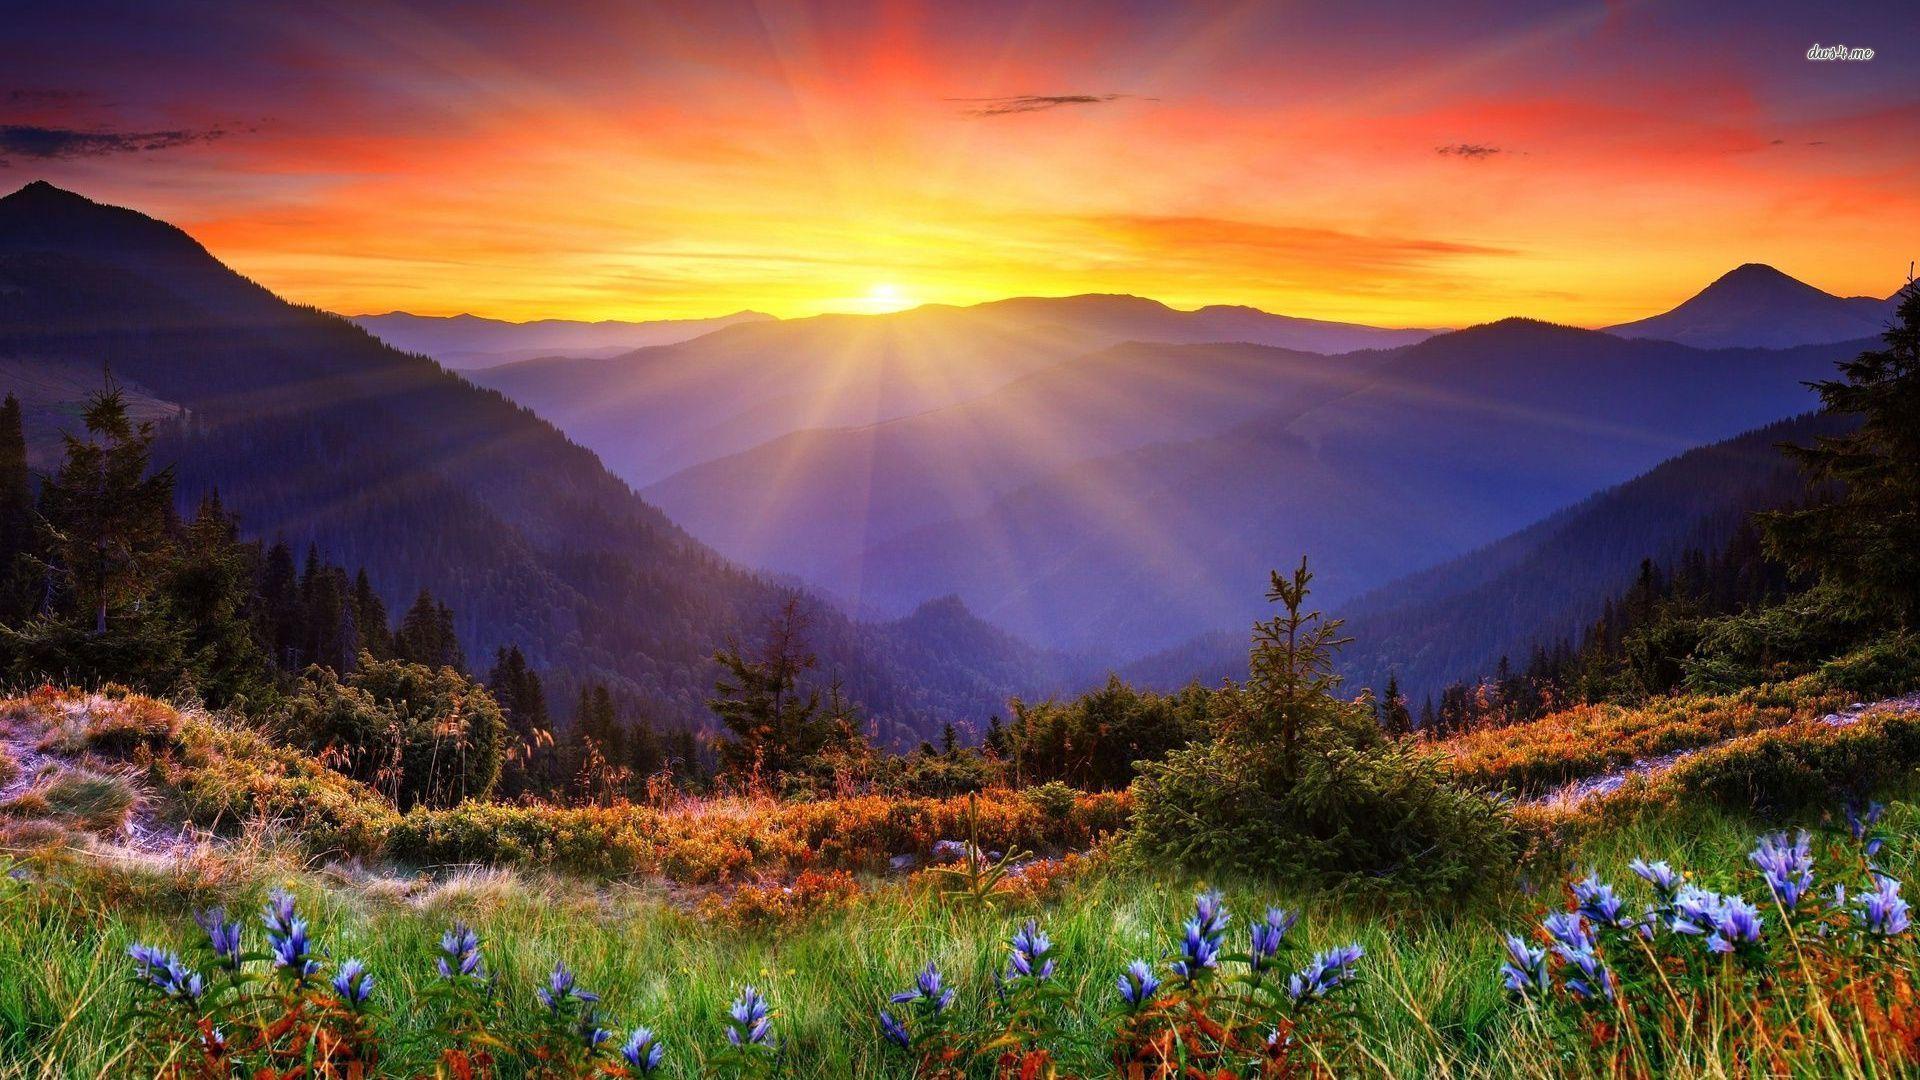 Mountain Sunrise Wallpapers Top Free Mountain Sunrise